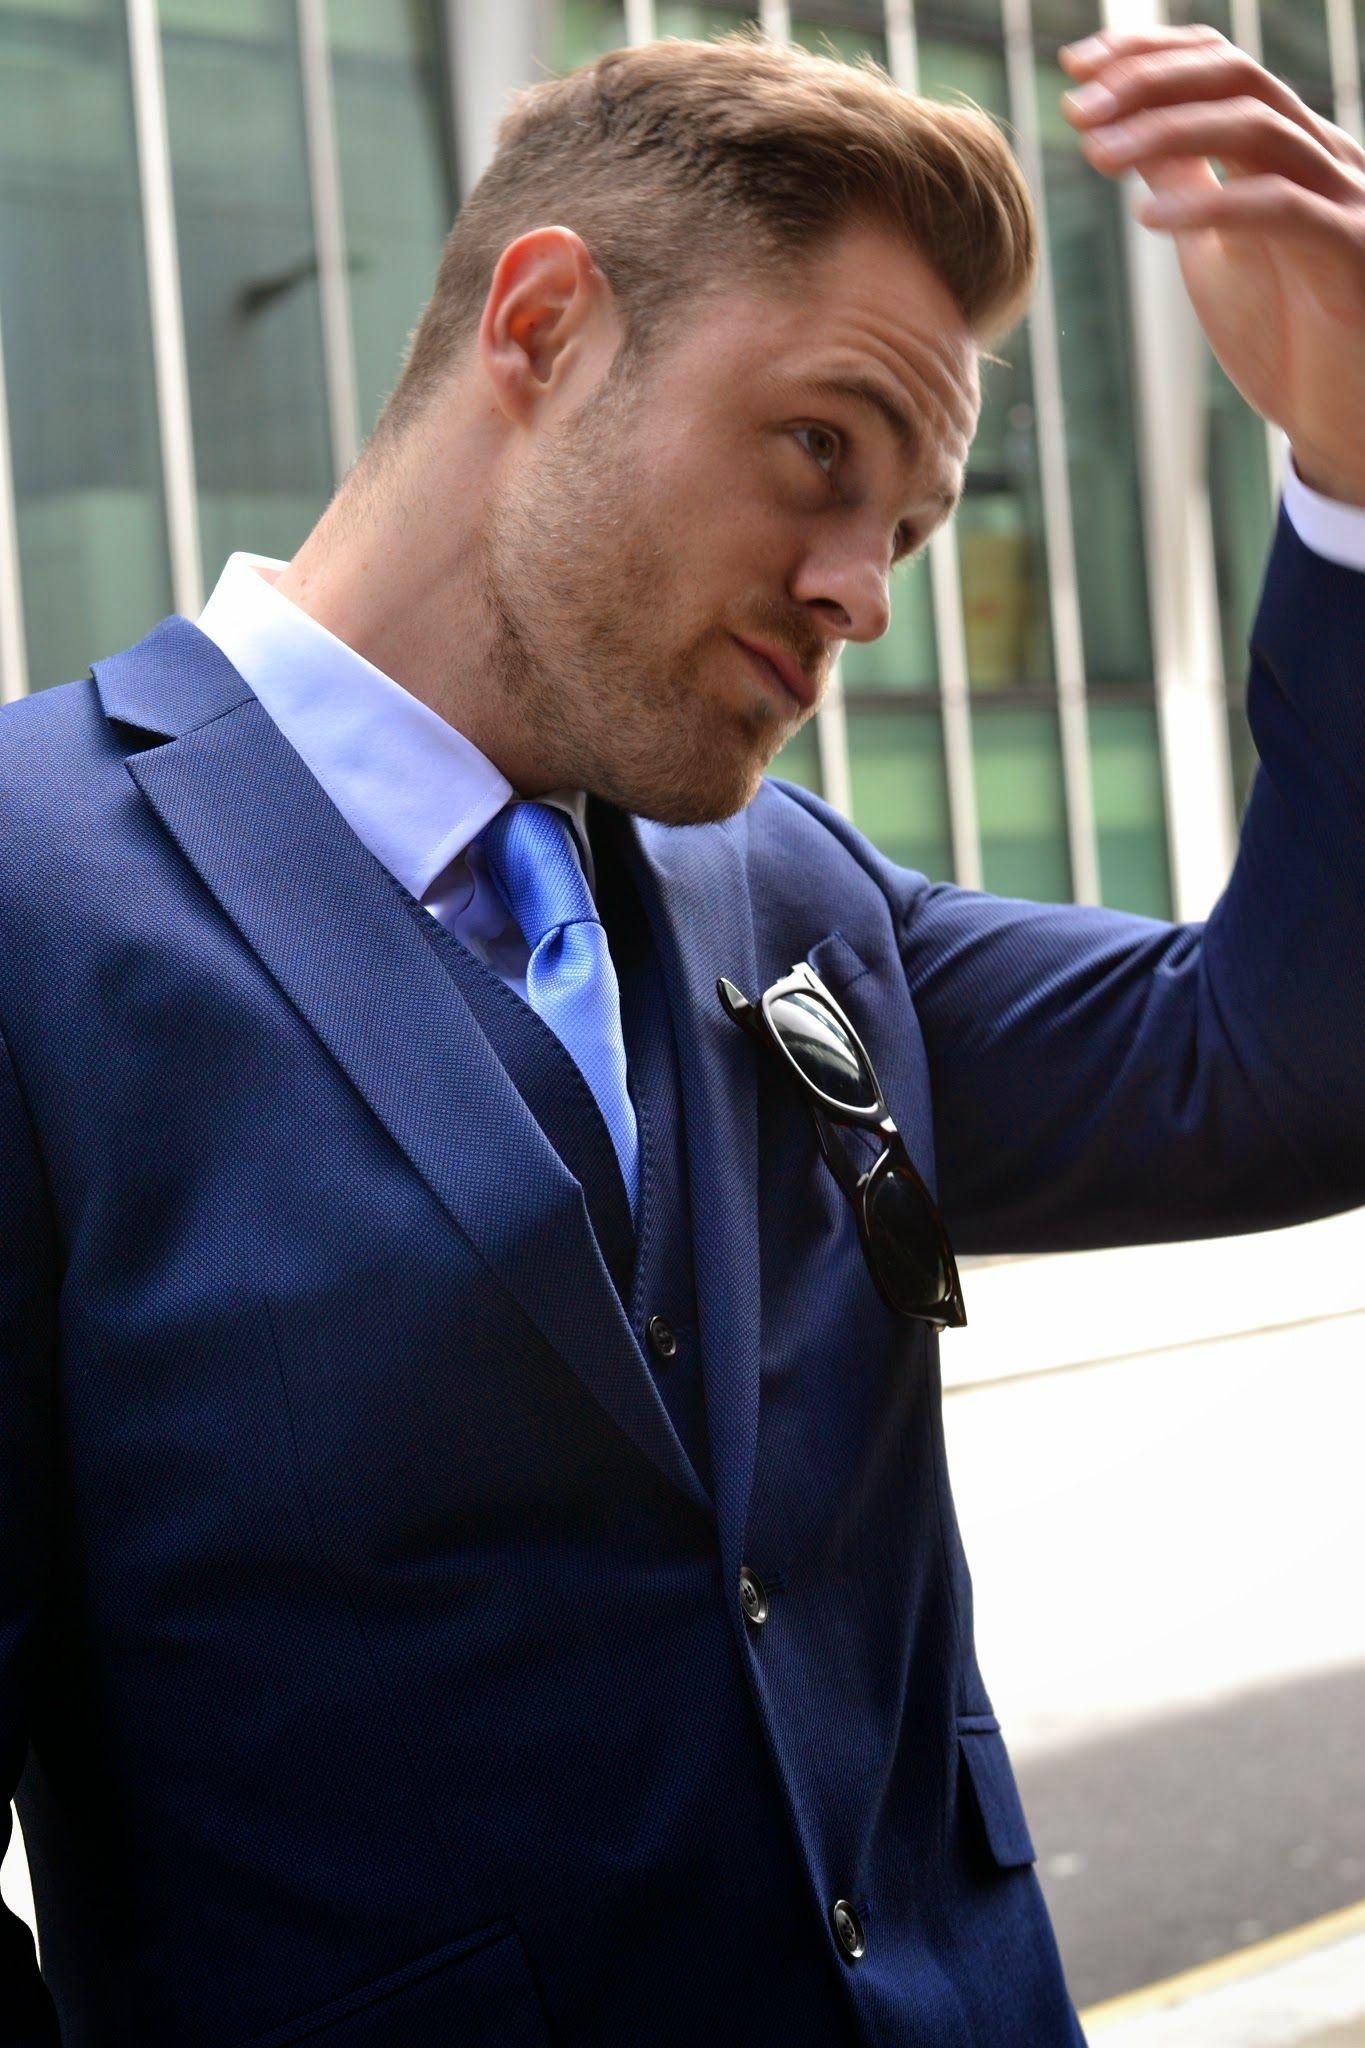 Ben fromTwenty First Century Gentwears a super durable M&S suit